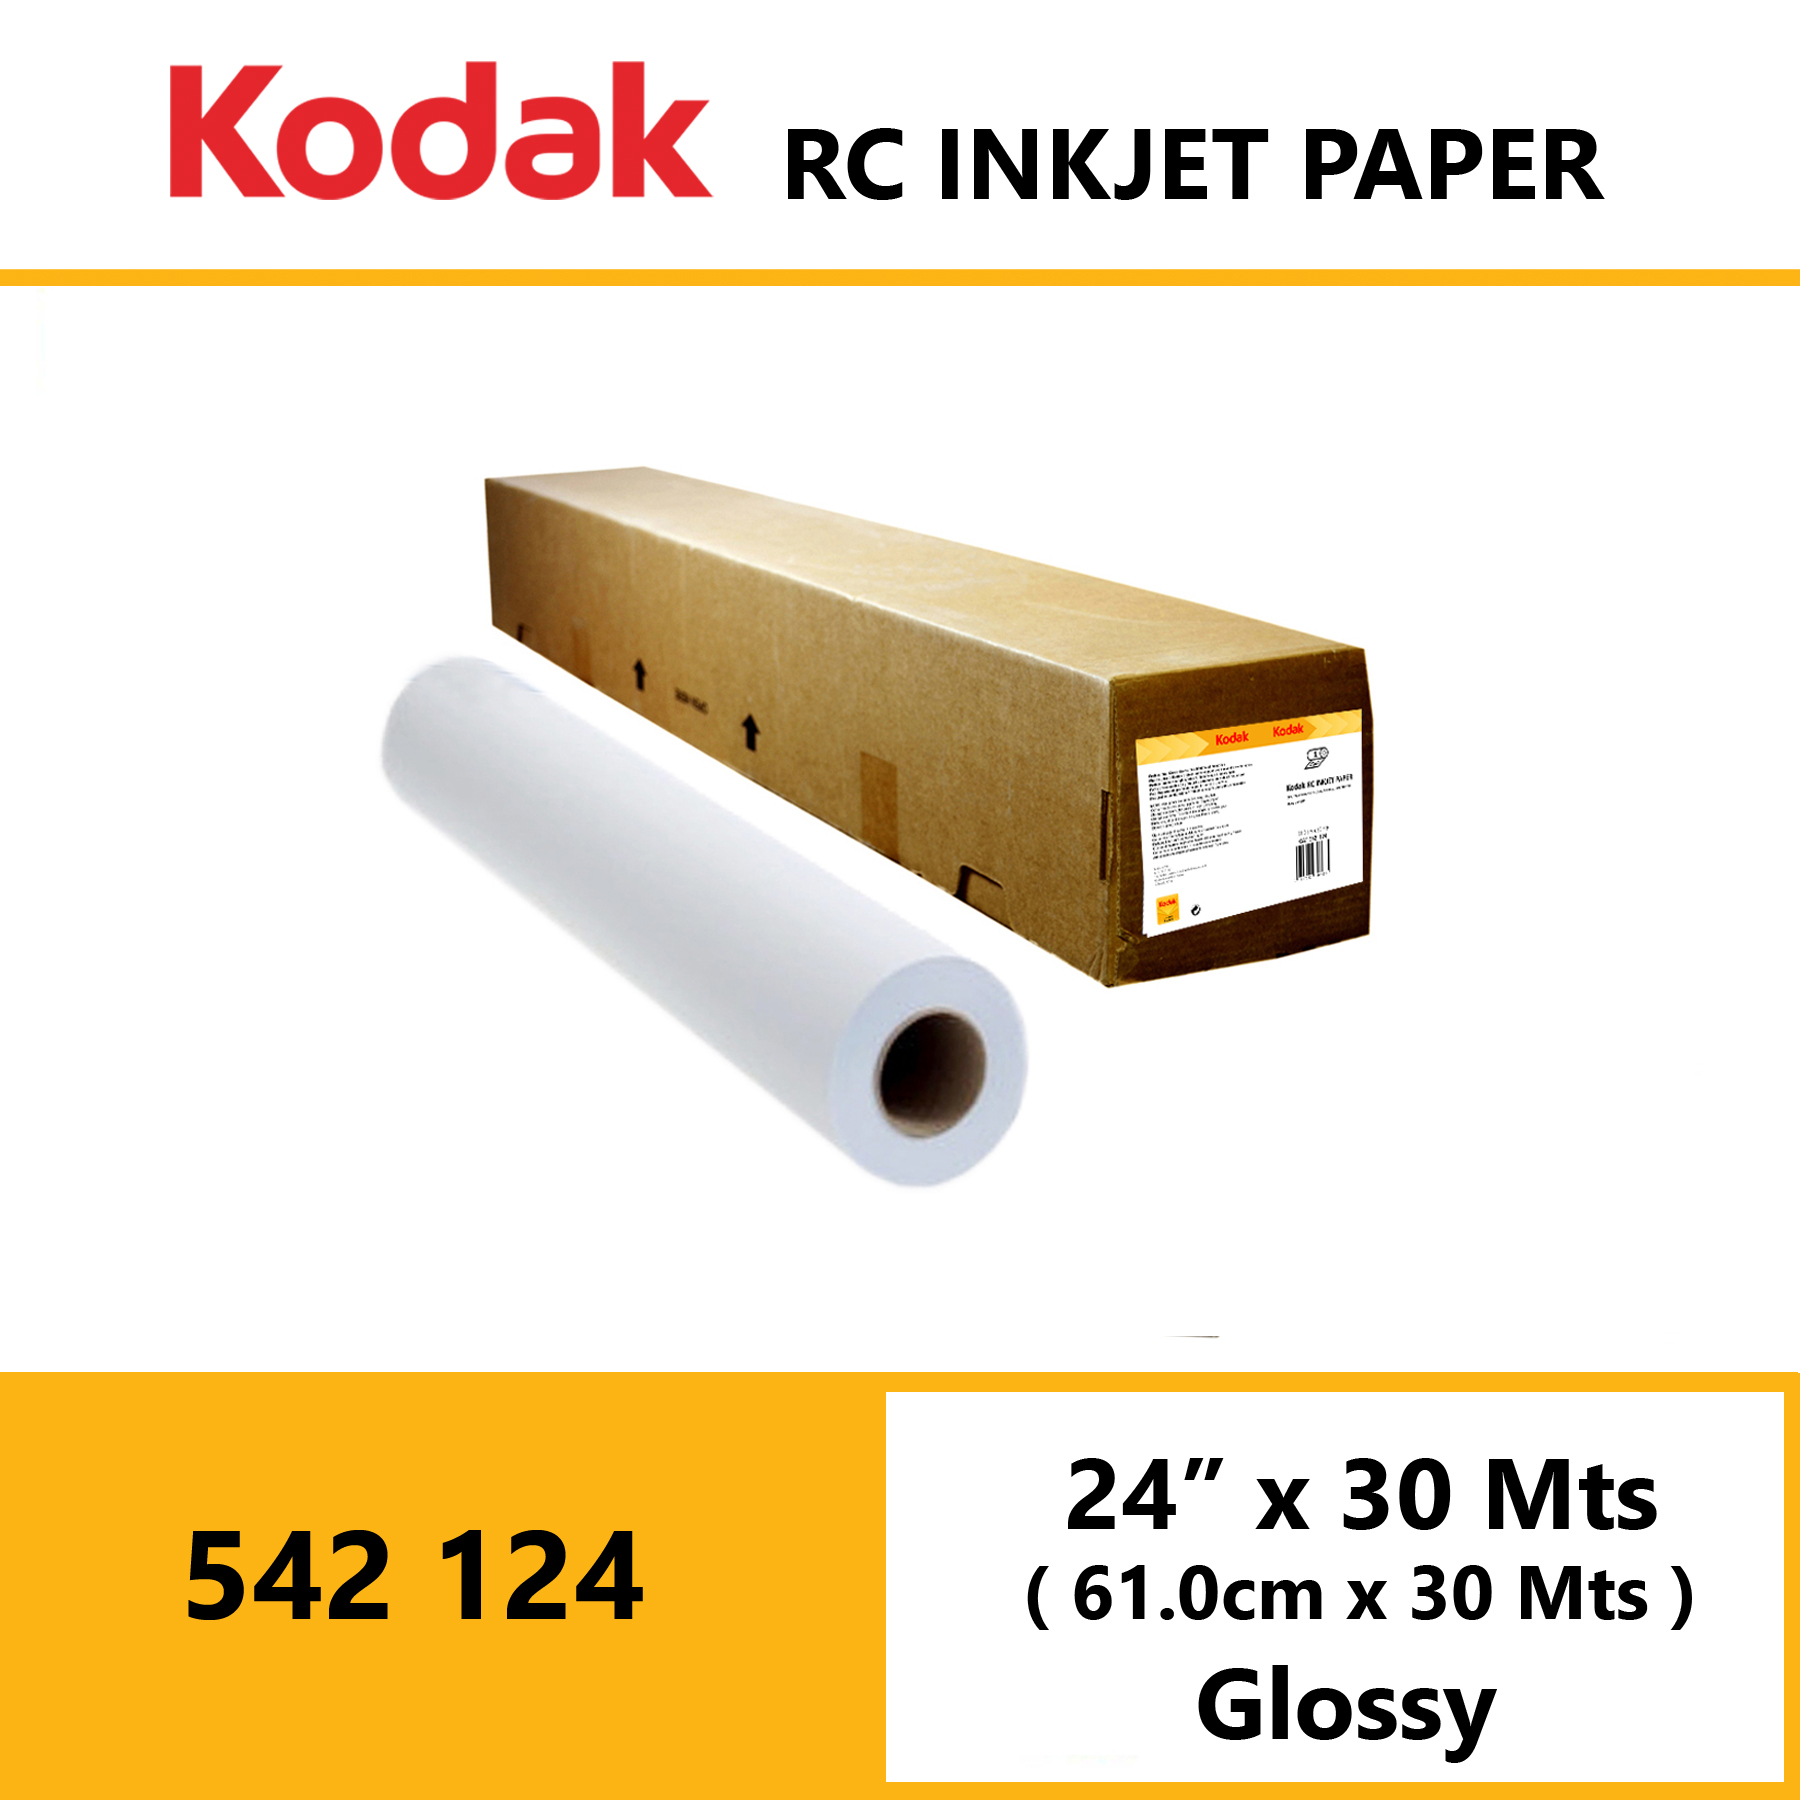 "Kodak Inkjet RC Paper 24"" x 30 Mtrs Glossy"